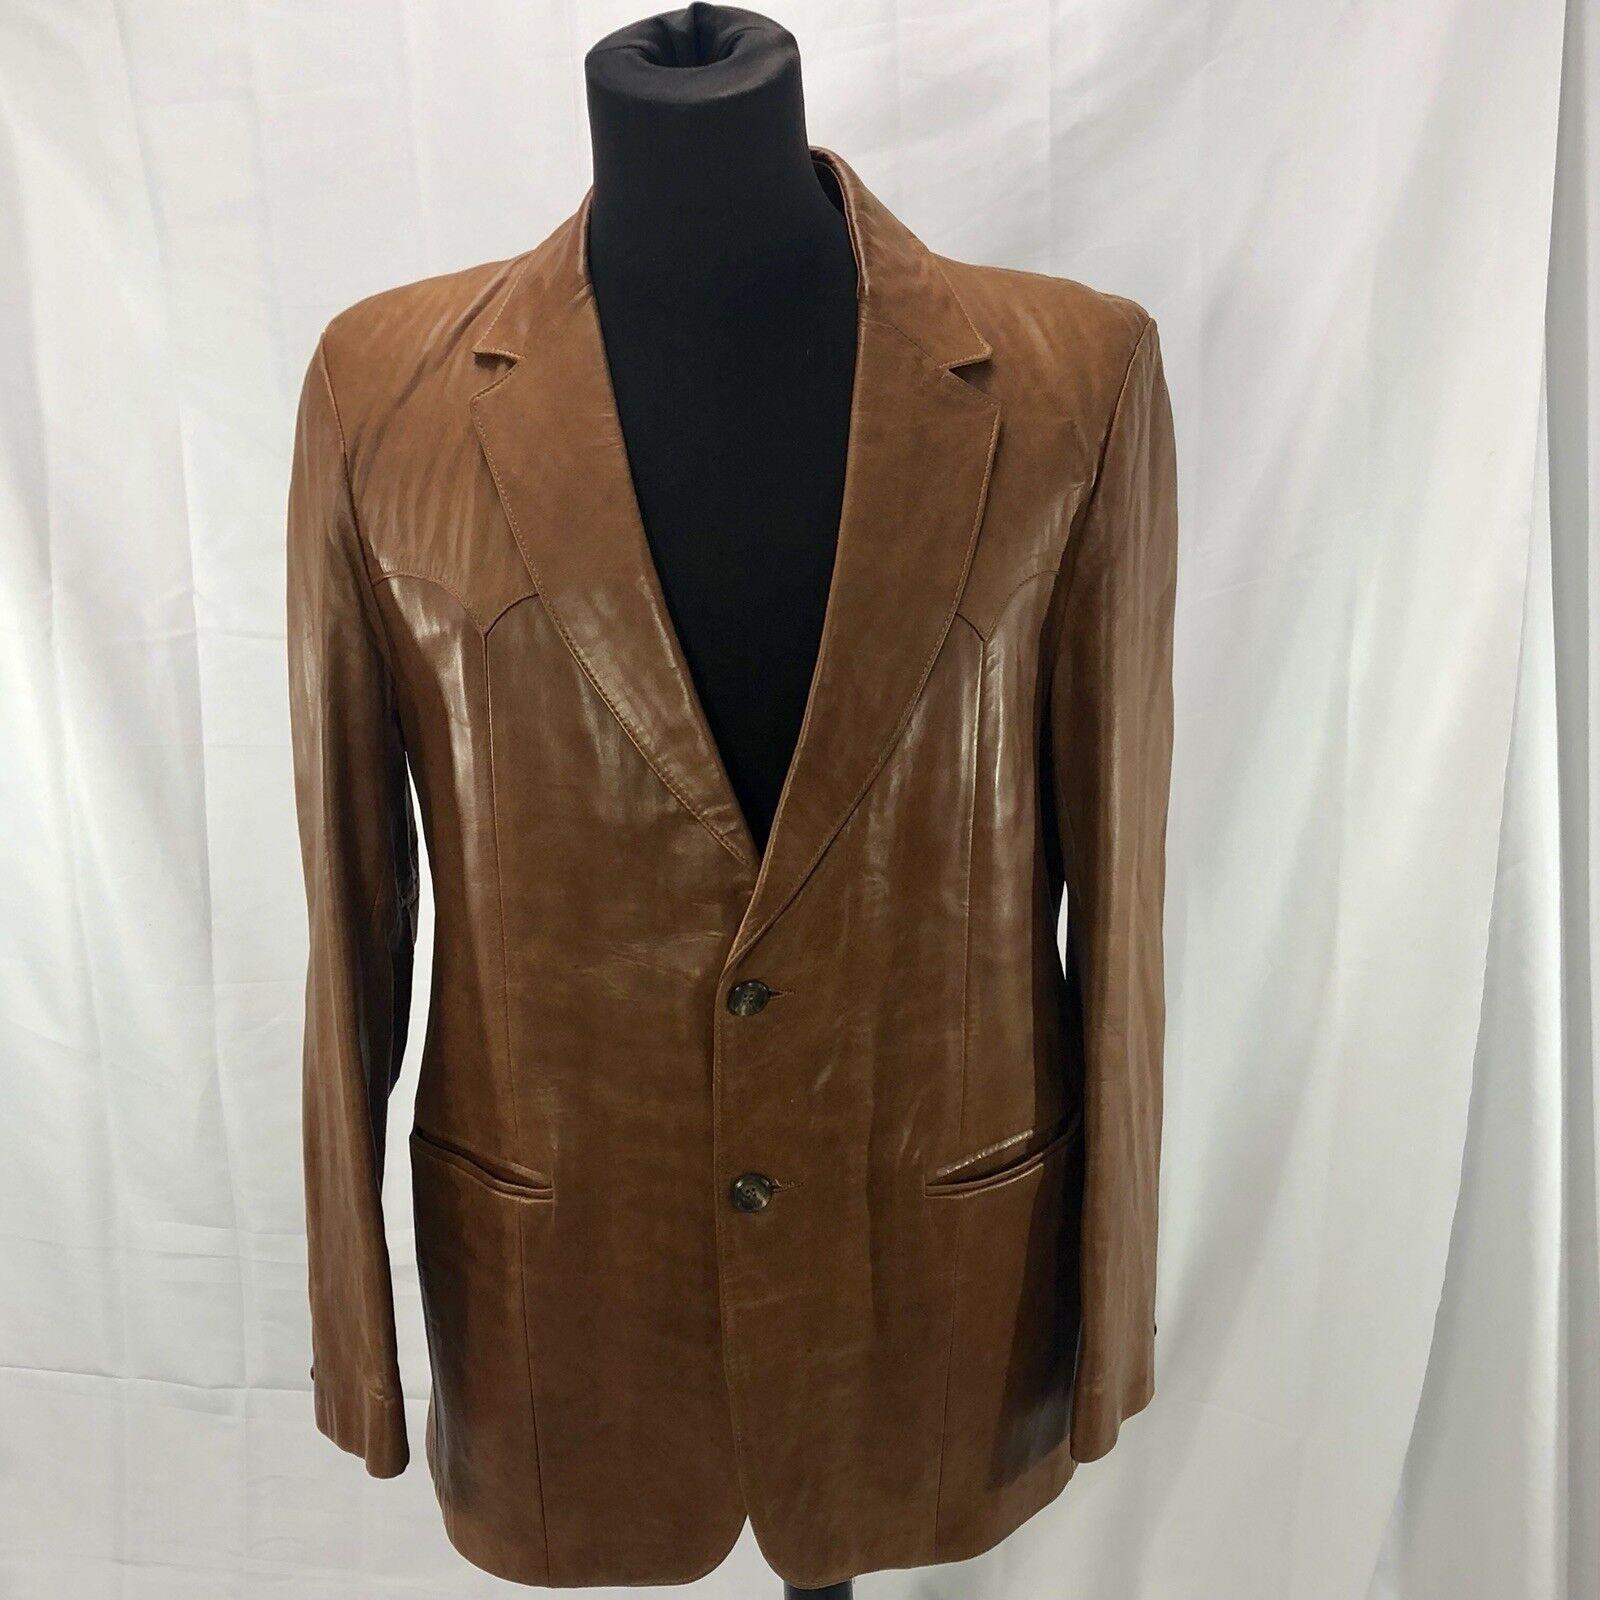 Vtg Scully Lederwear  Herren Tan Soft Leder Fancy Sport Western Cowboy SZ 44